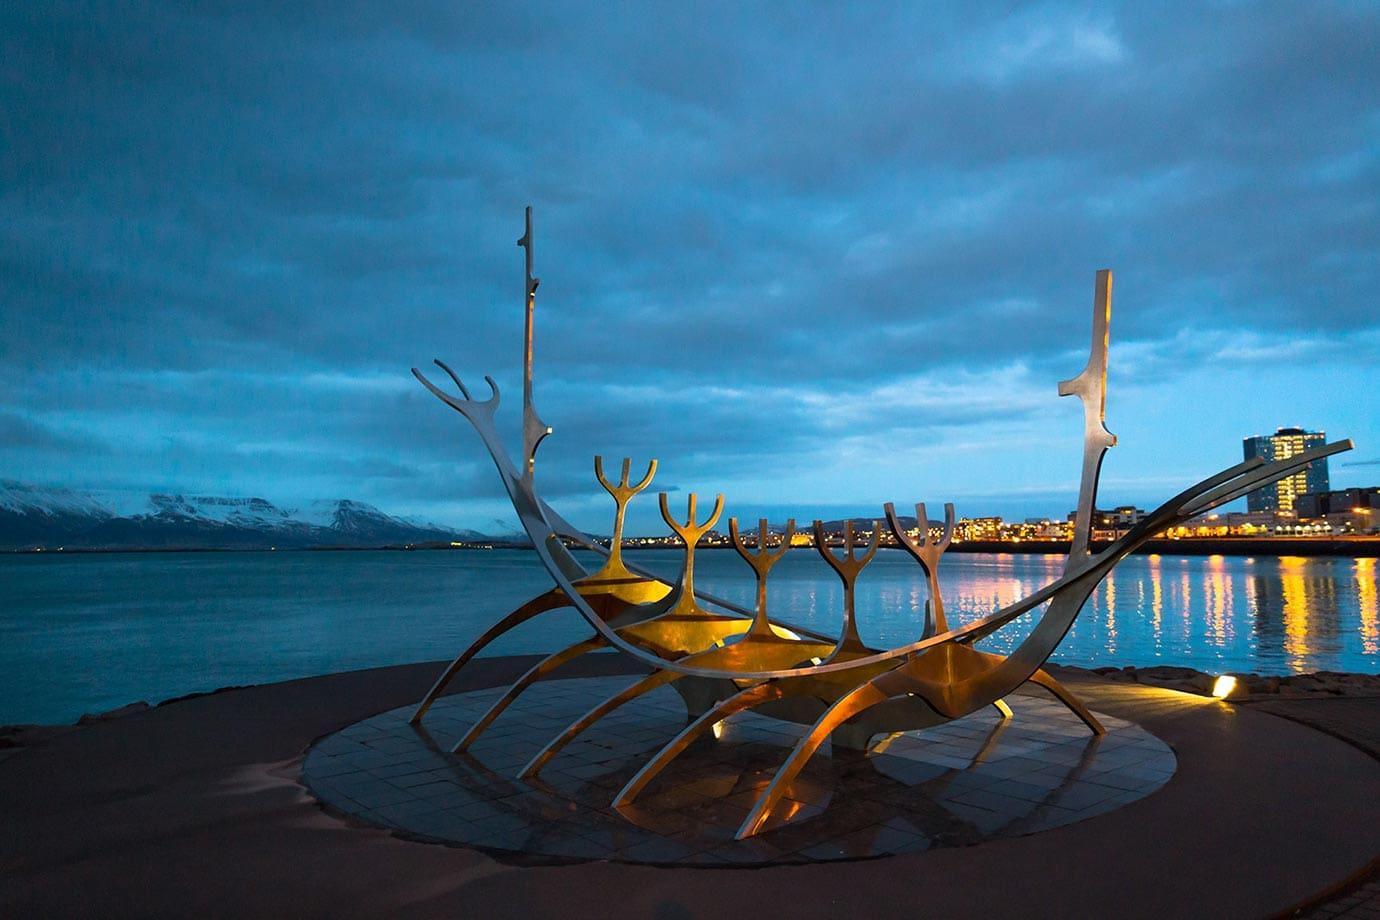 Sun Voyager sculpture, Reykjavik